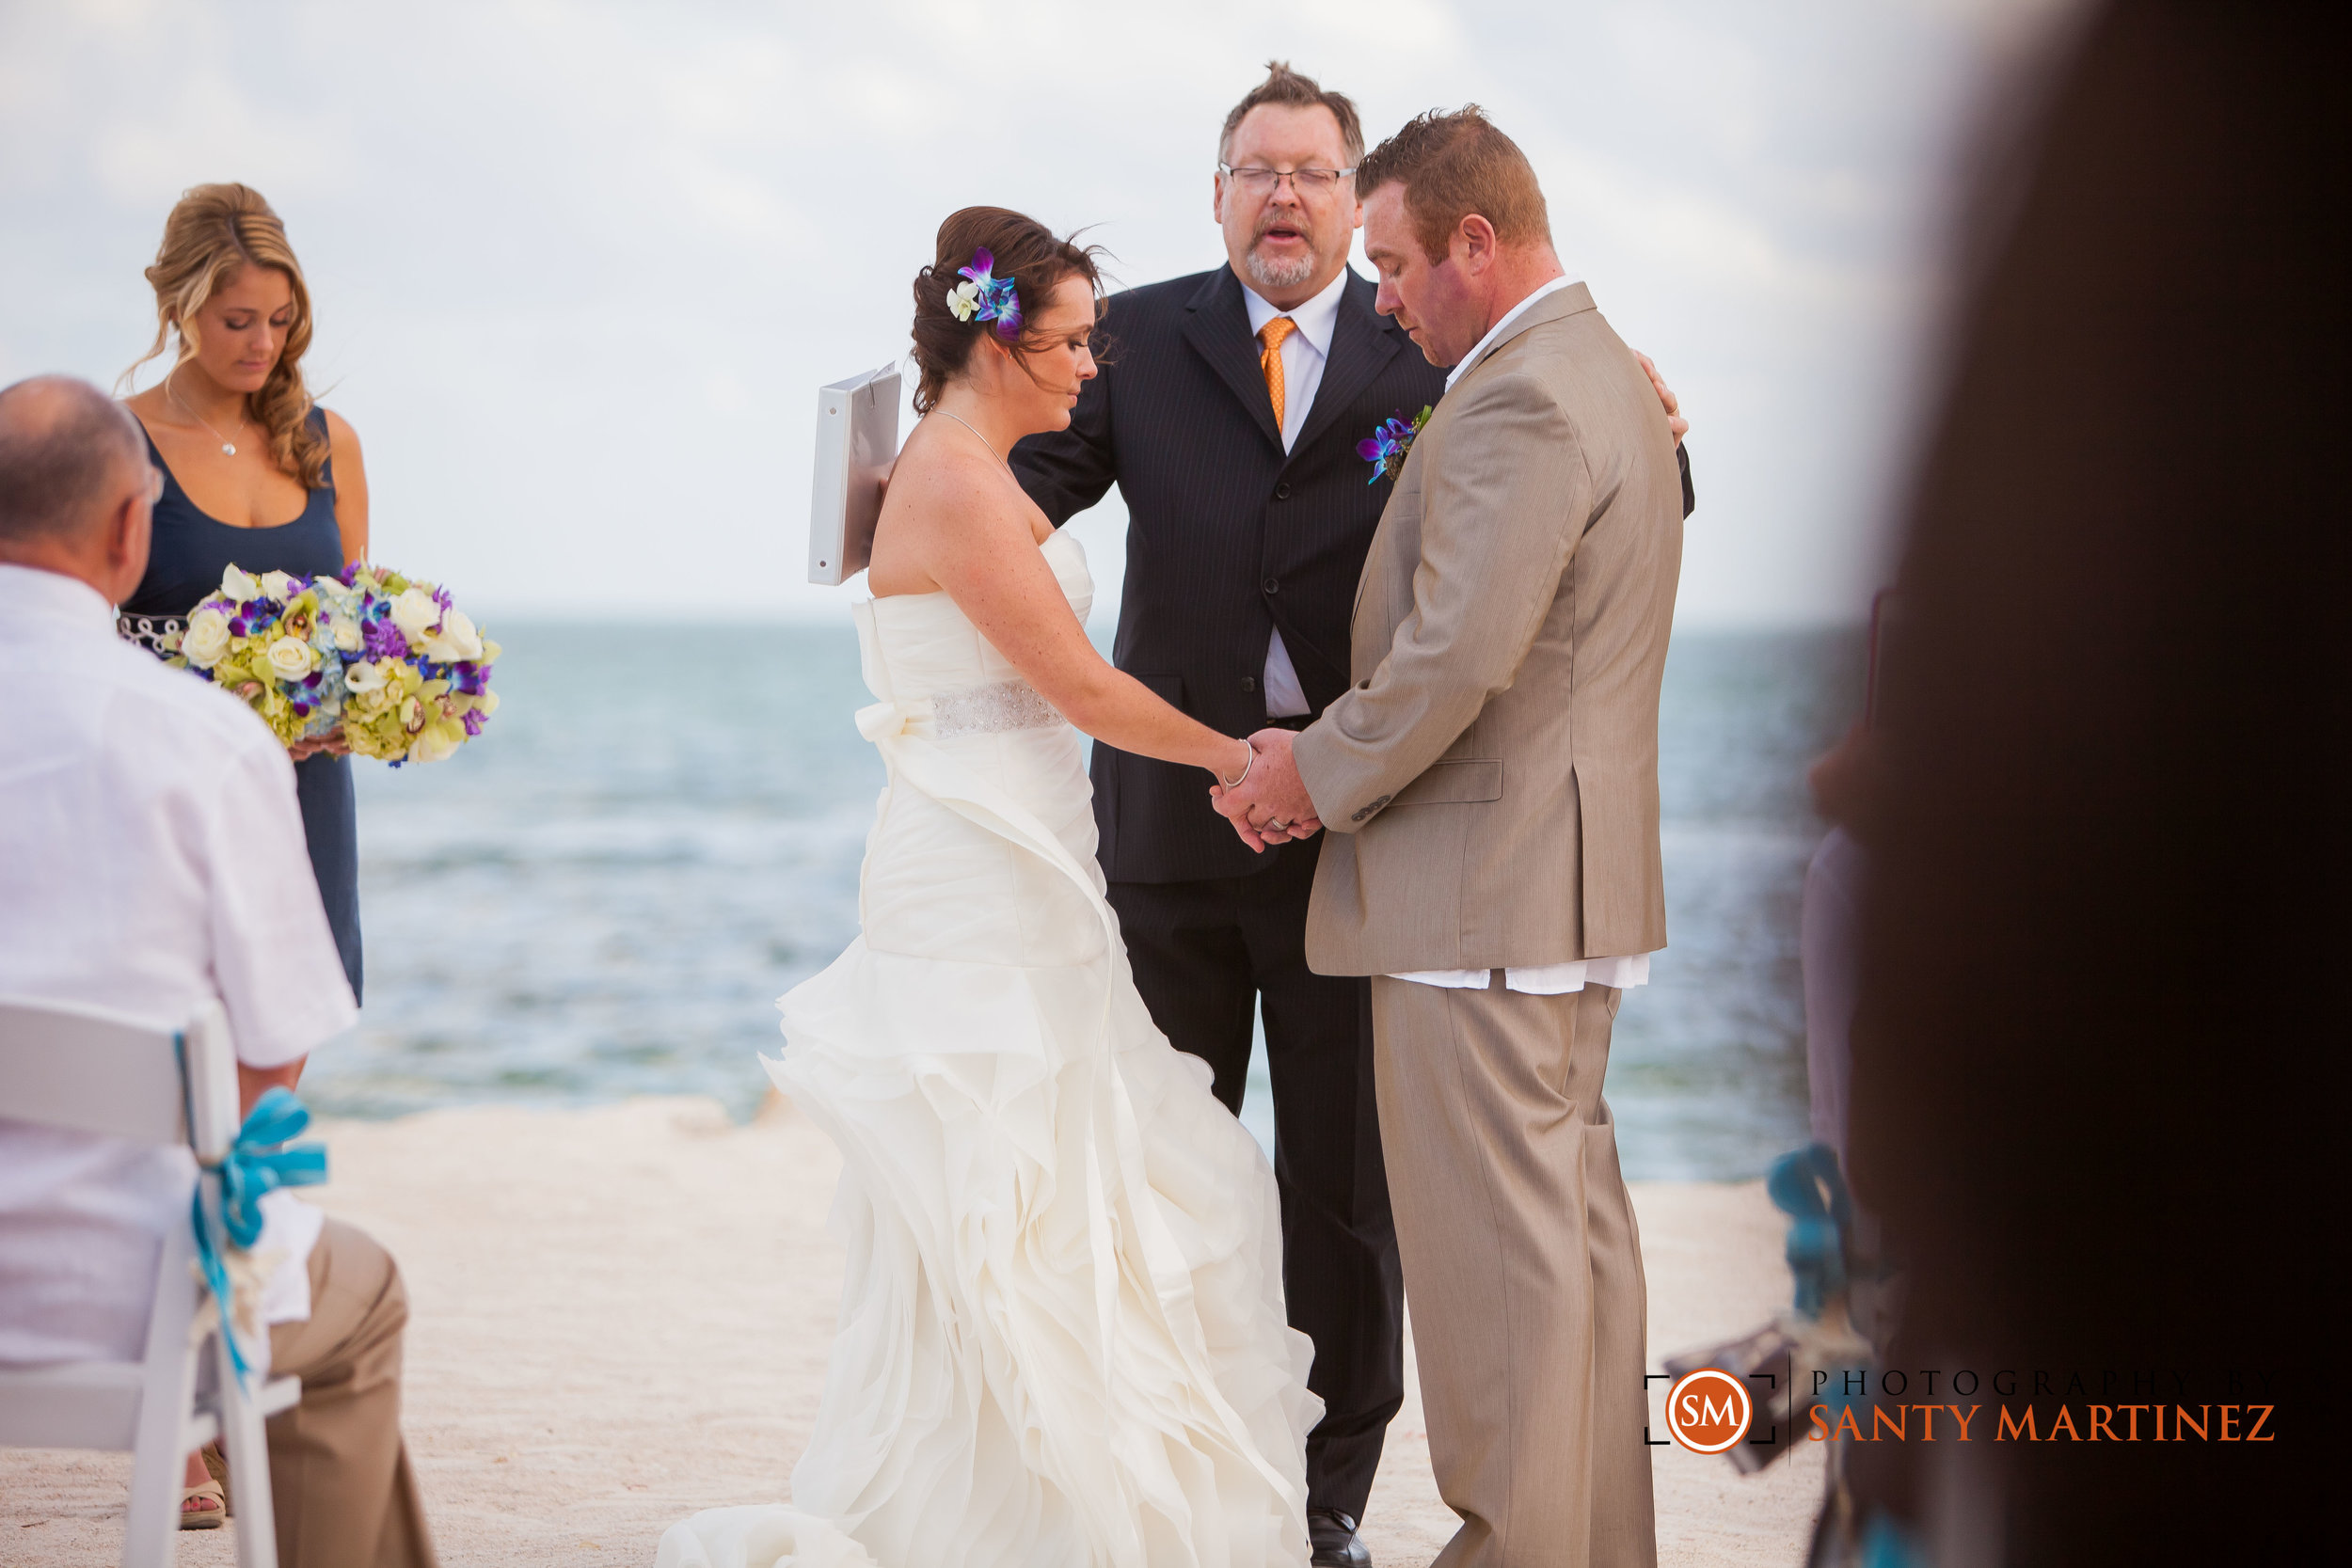 Photography by Santy Martinez - Miami Wedding Photographer-038.jpg